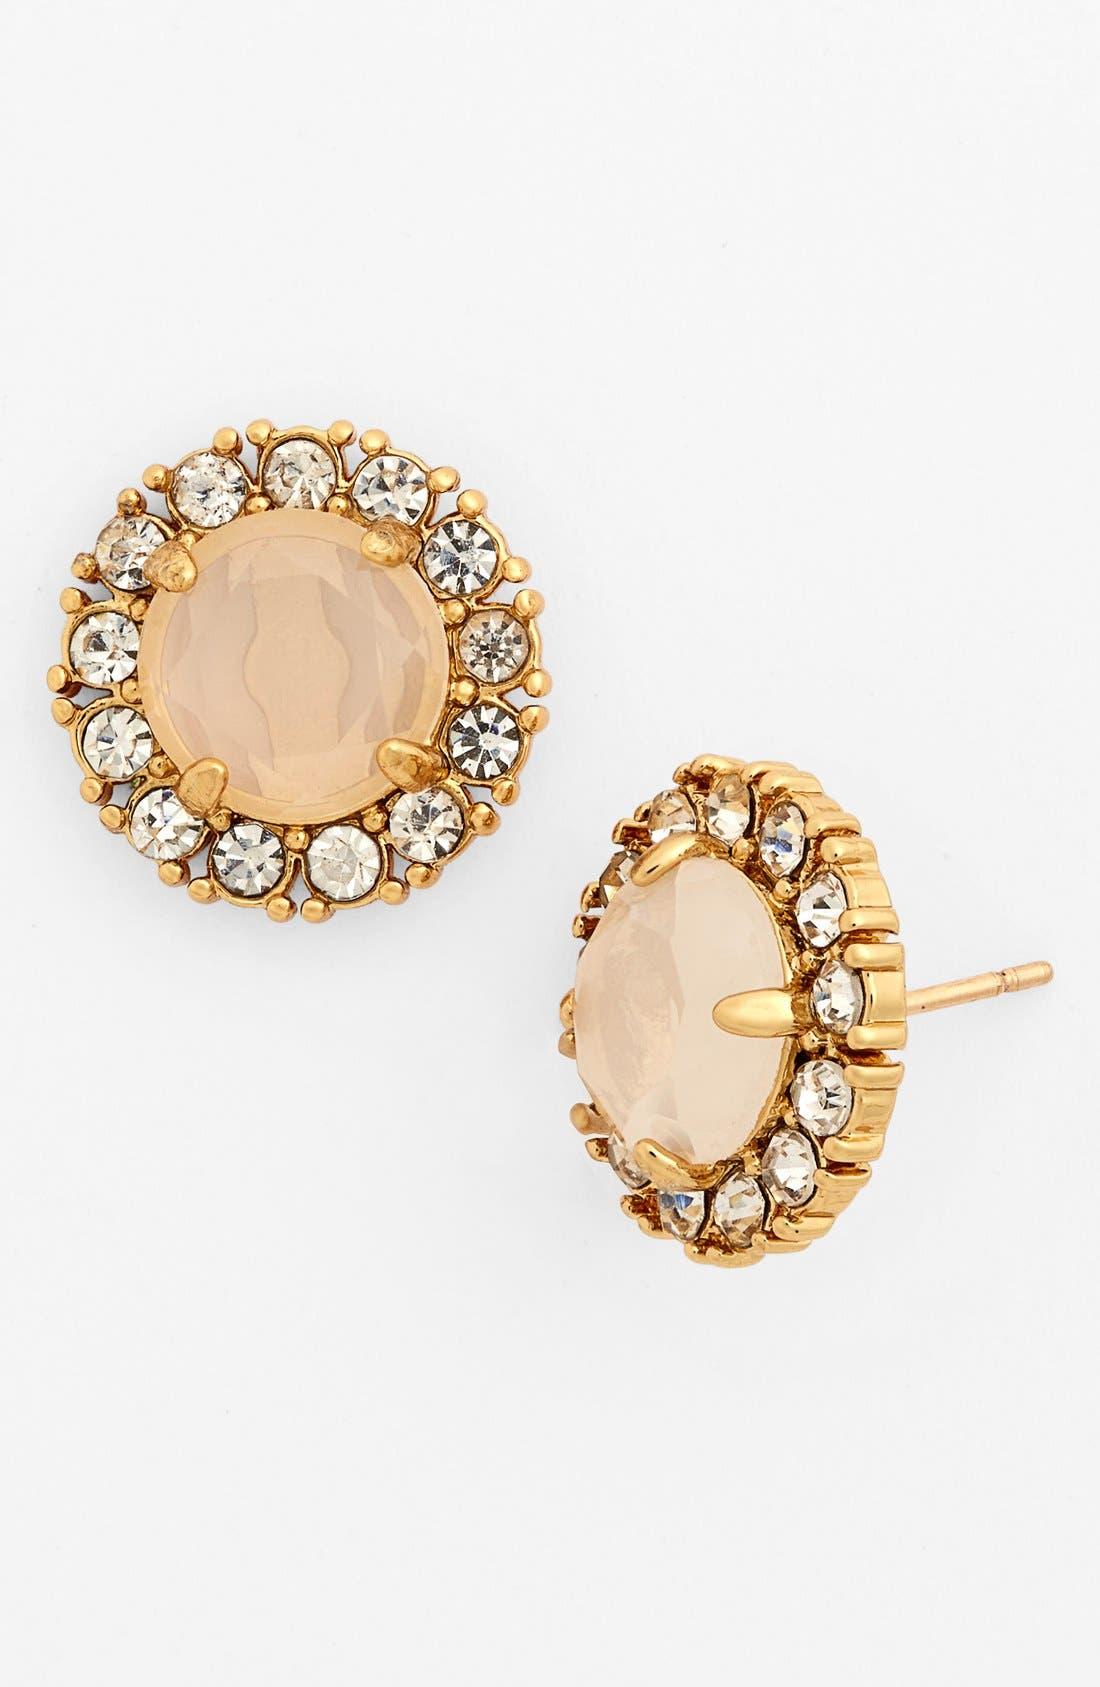 Main Image - kate spade new york 'secret garden' mixed stone stud earrings